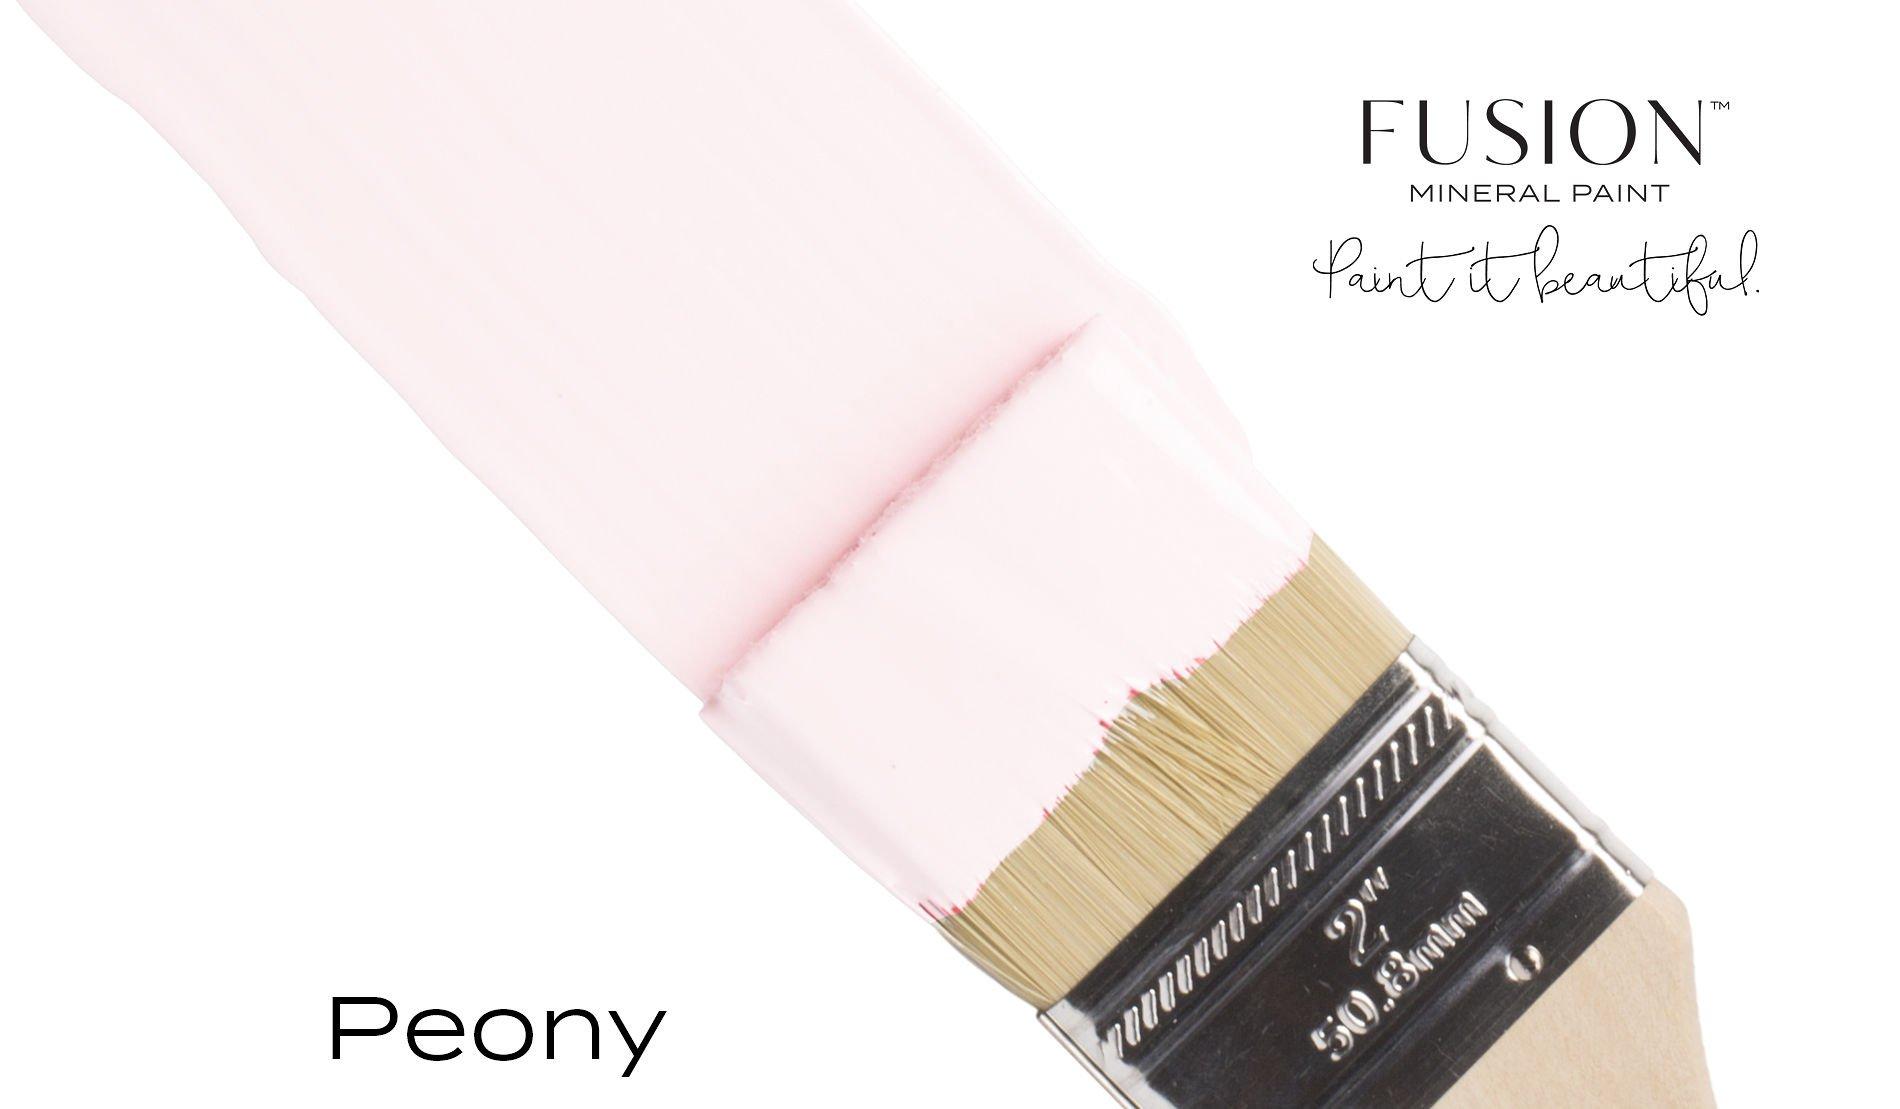 Fusion Mineral Paint Brushstroke - Peony | www.raggedy-bits.com